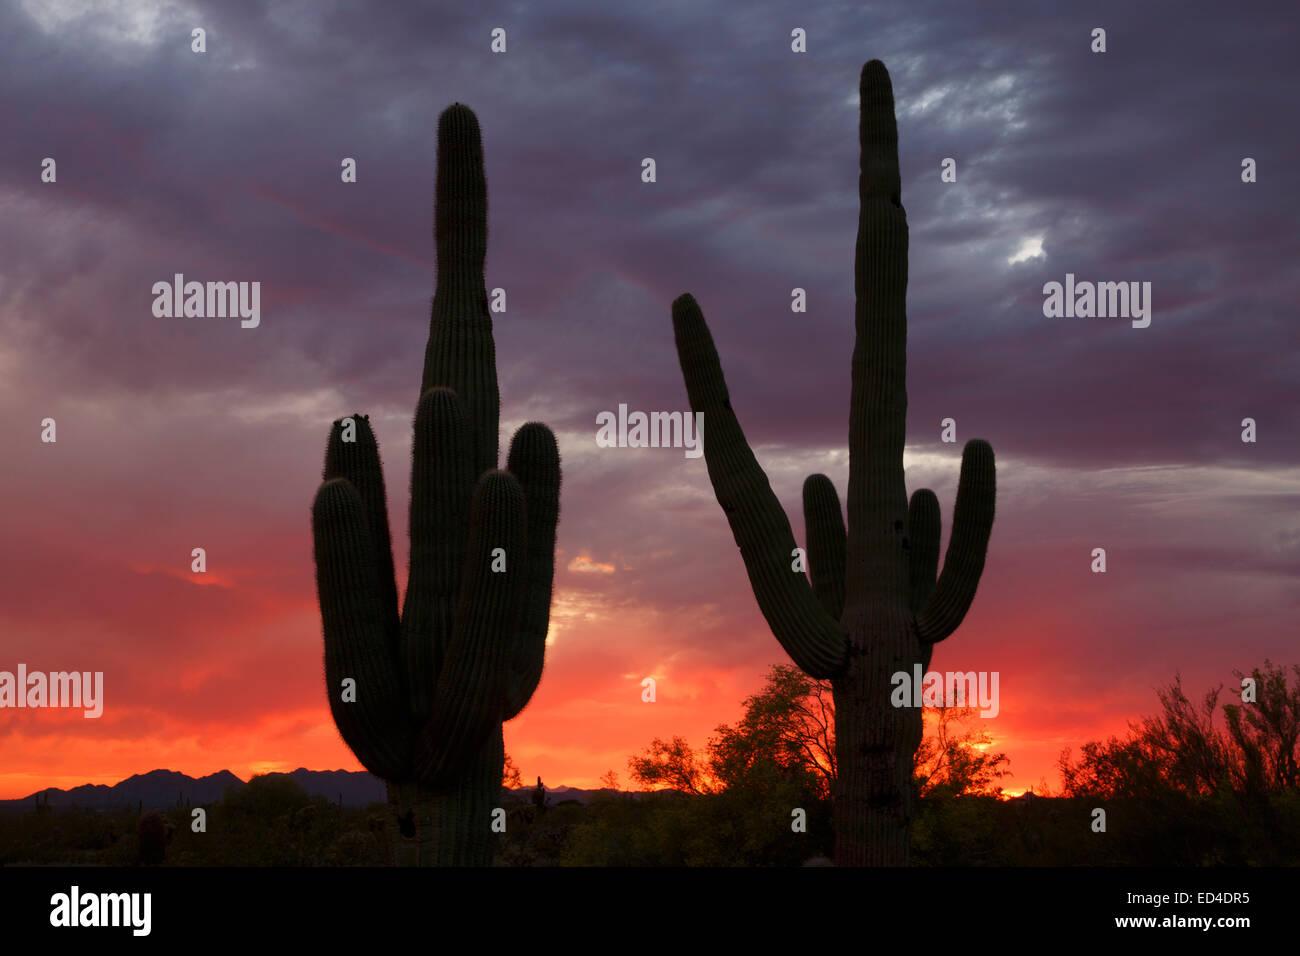 Saguaro-Kaktus bei Sonnenuntergang, Scottsdale, Arizona. Stockfoto